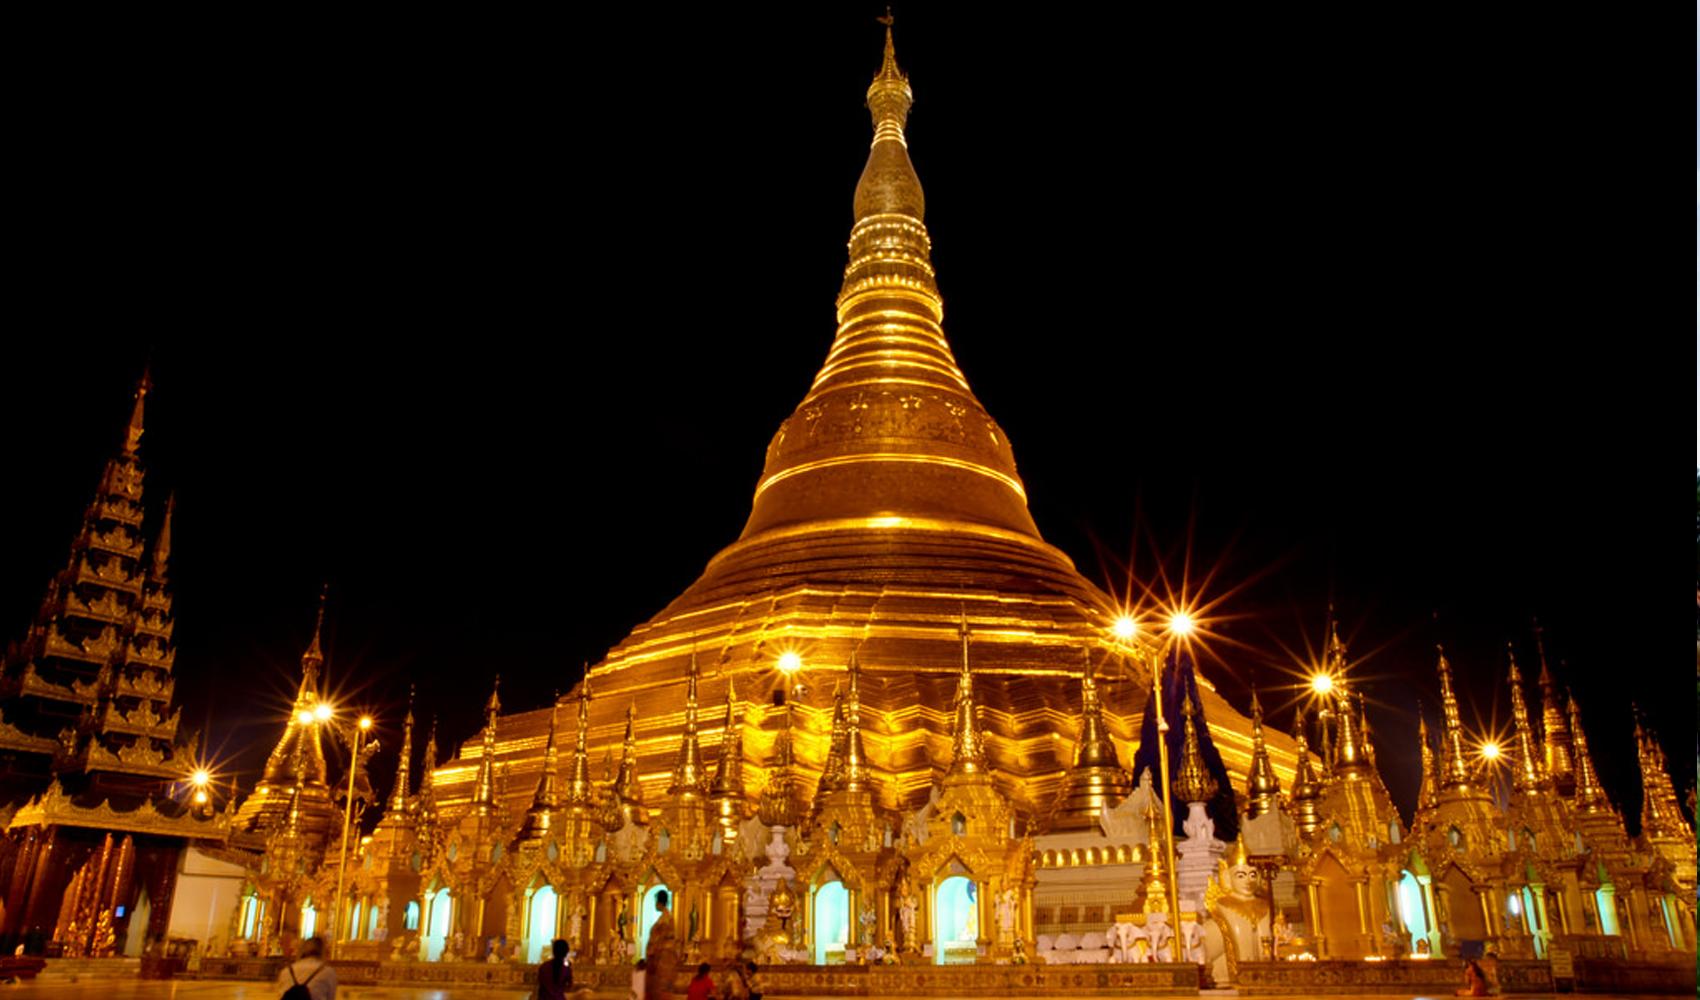 32 Destinasi Wisata Alam Sumatera Utara Wajib Kunjungi Berupa Pagoda